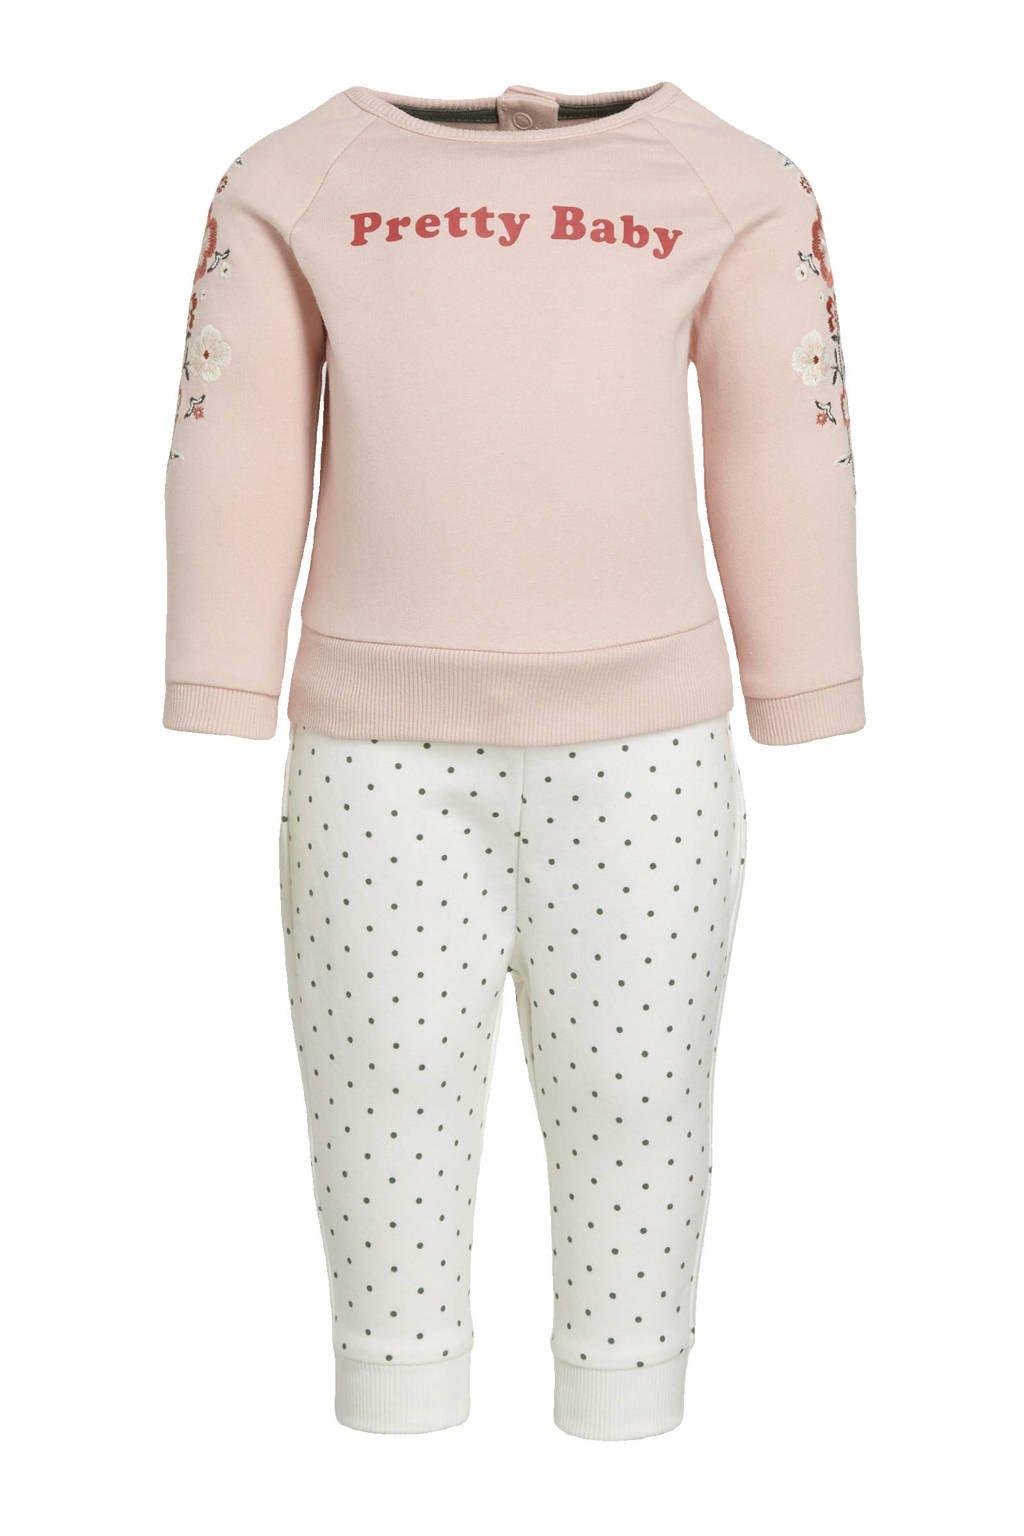 C&A Palomino babybroek + sweater lichtroze/ecru